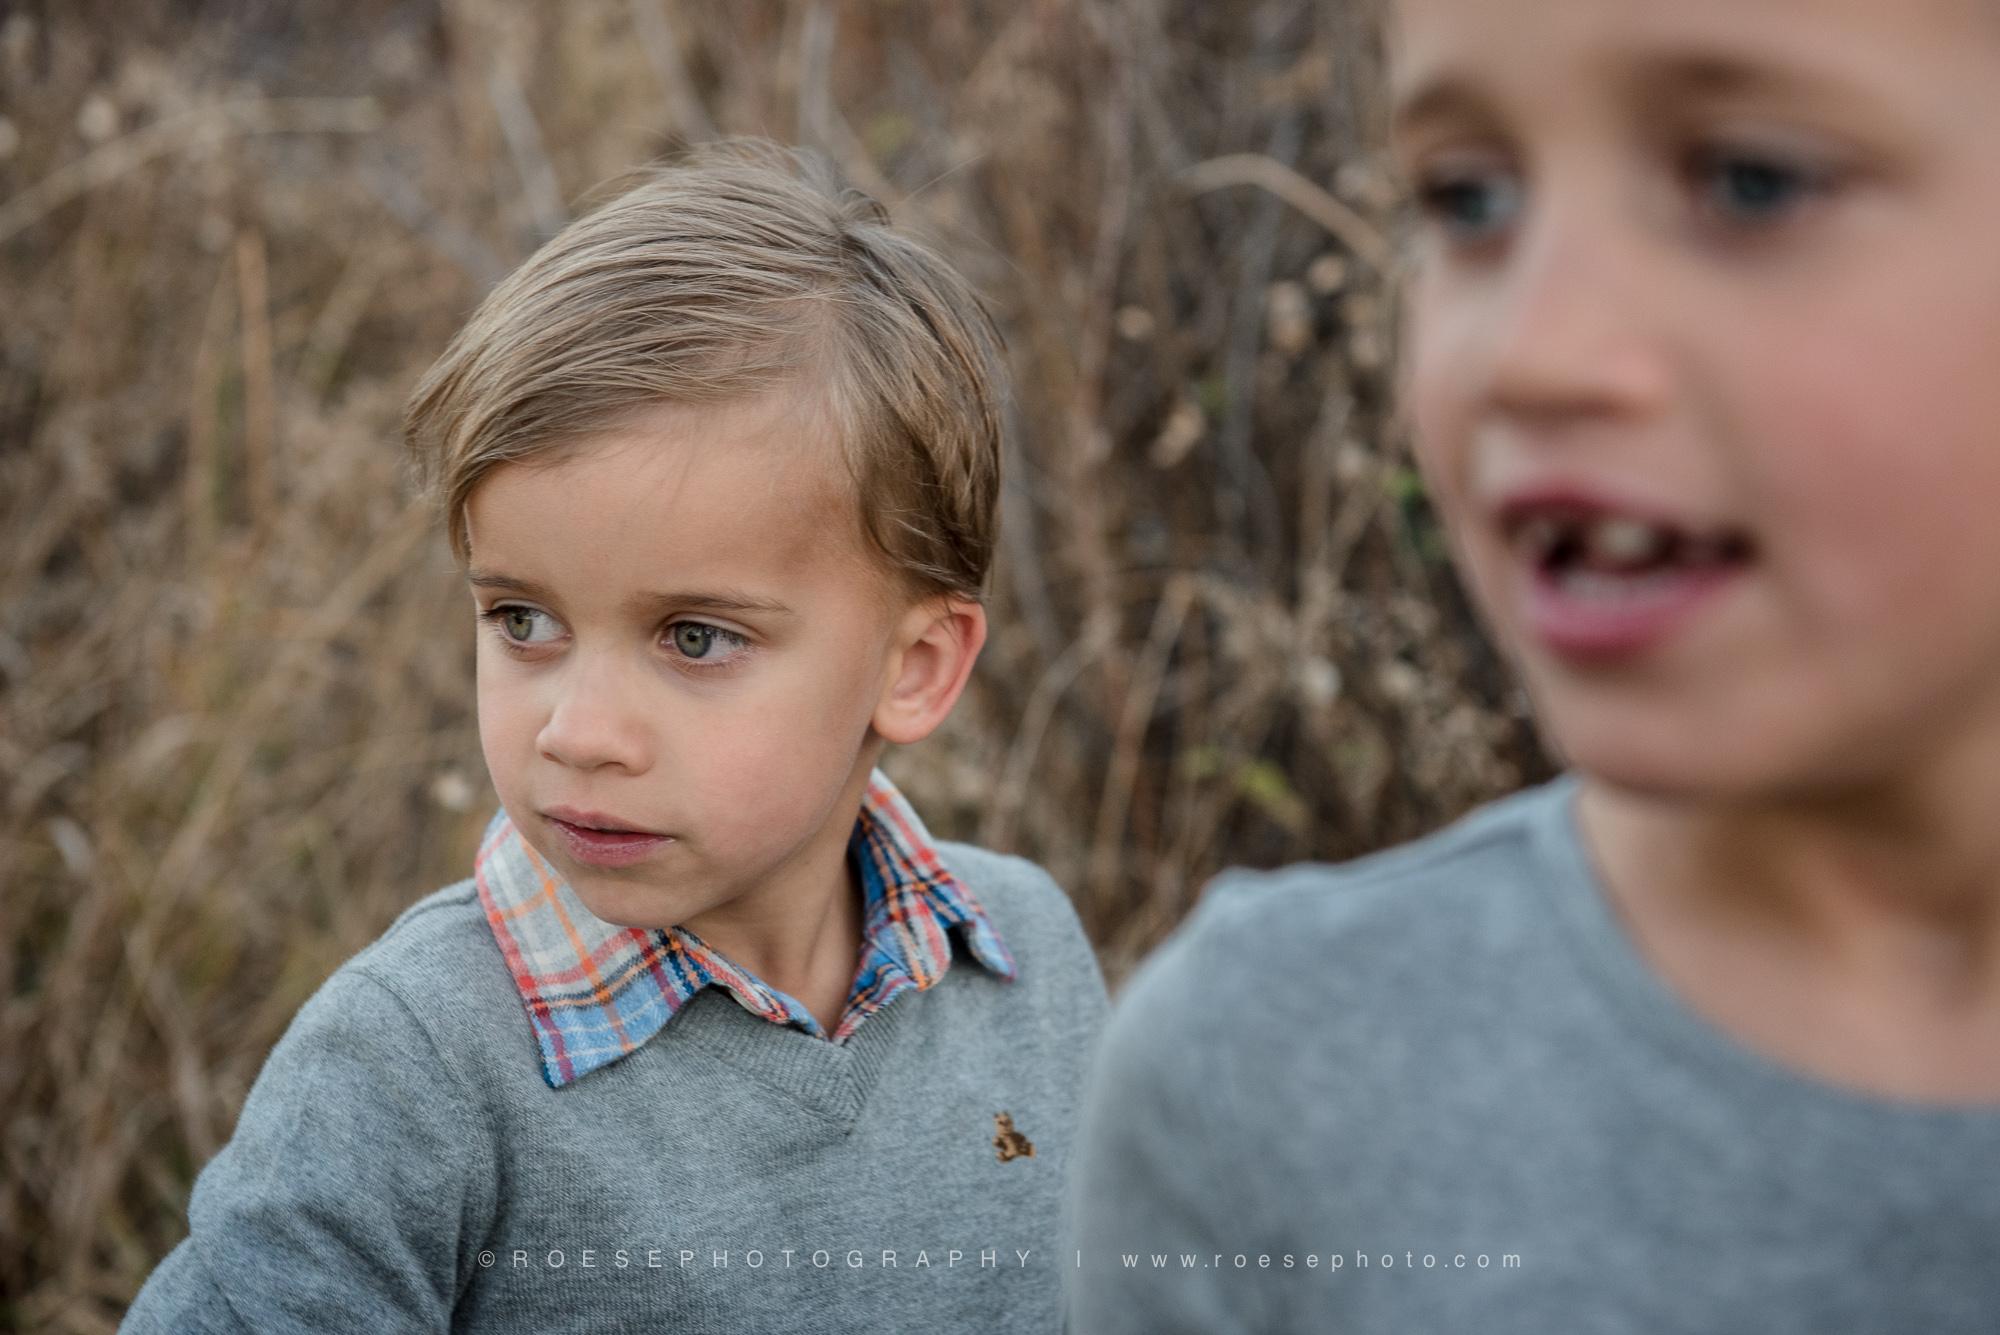 Roese_Photography.Pedersen-8.jpg